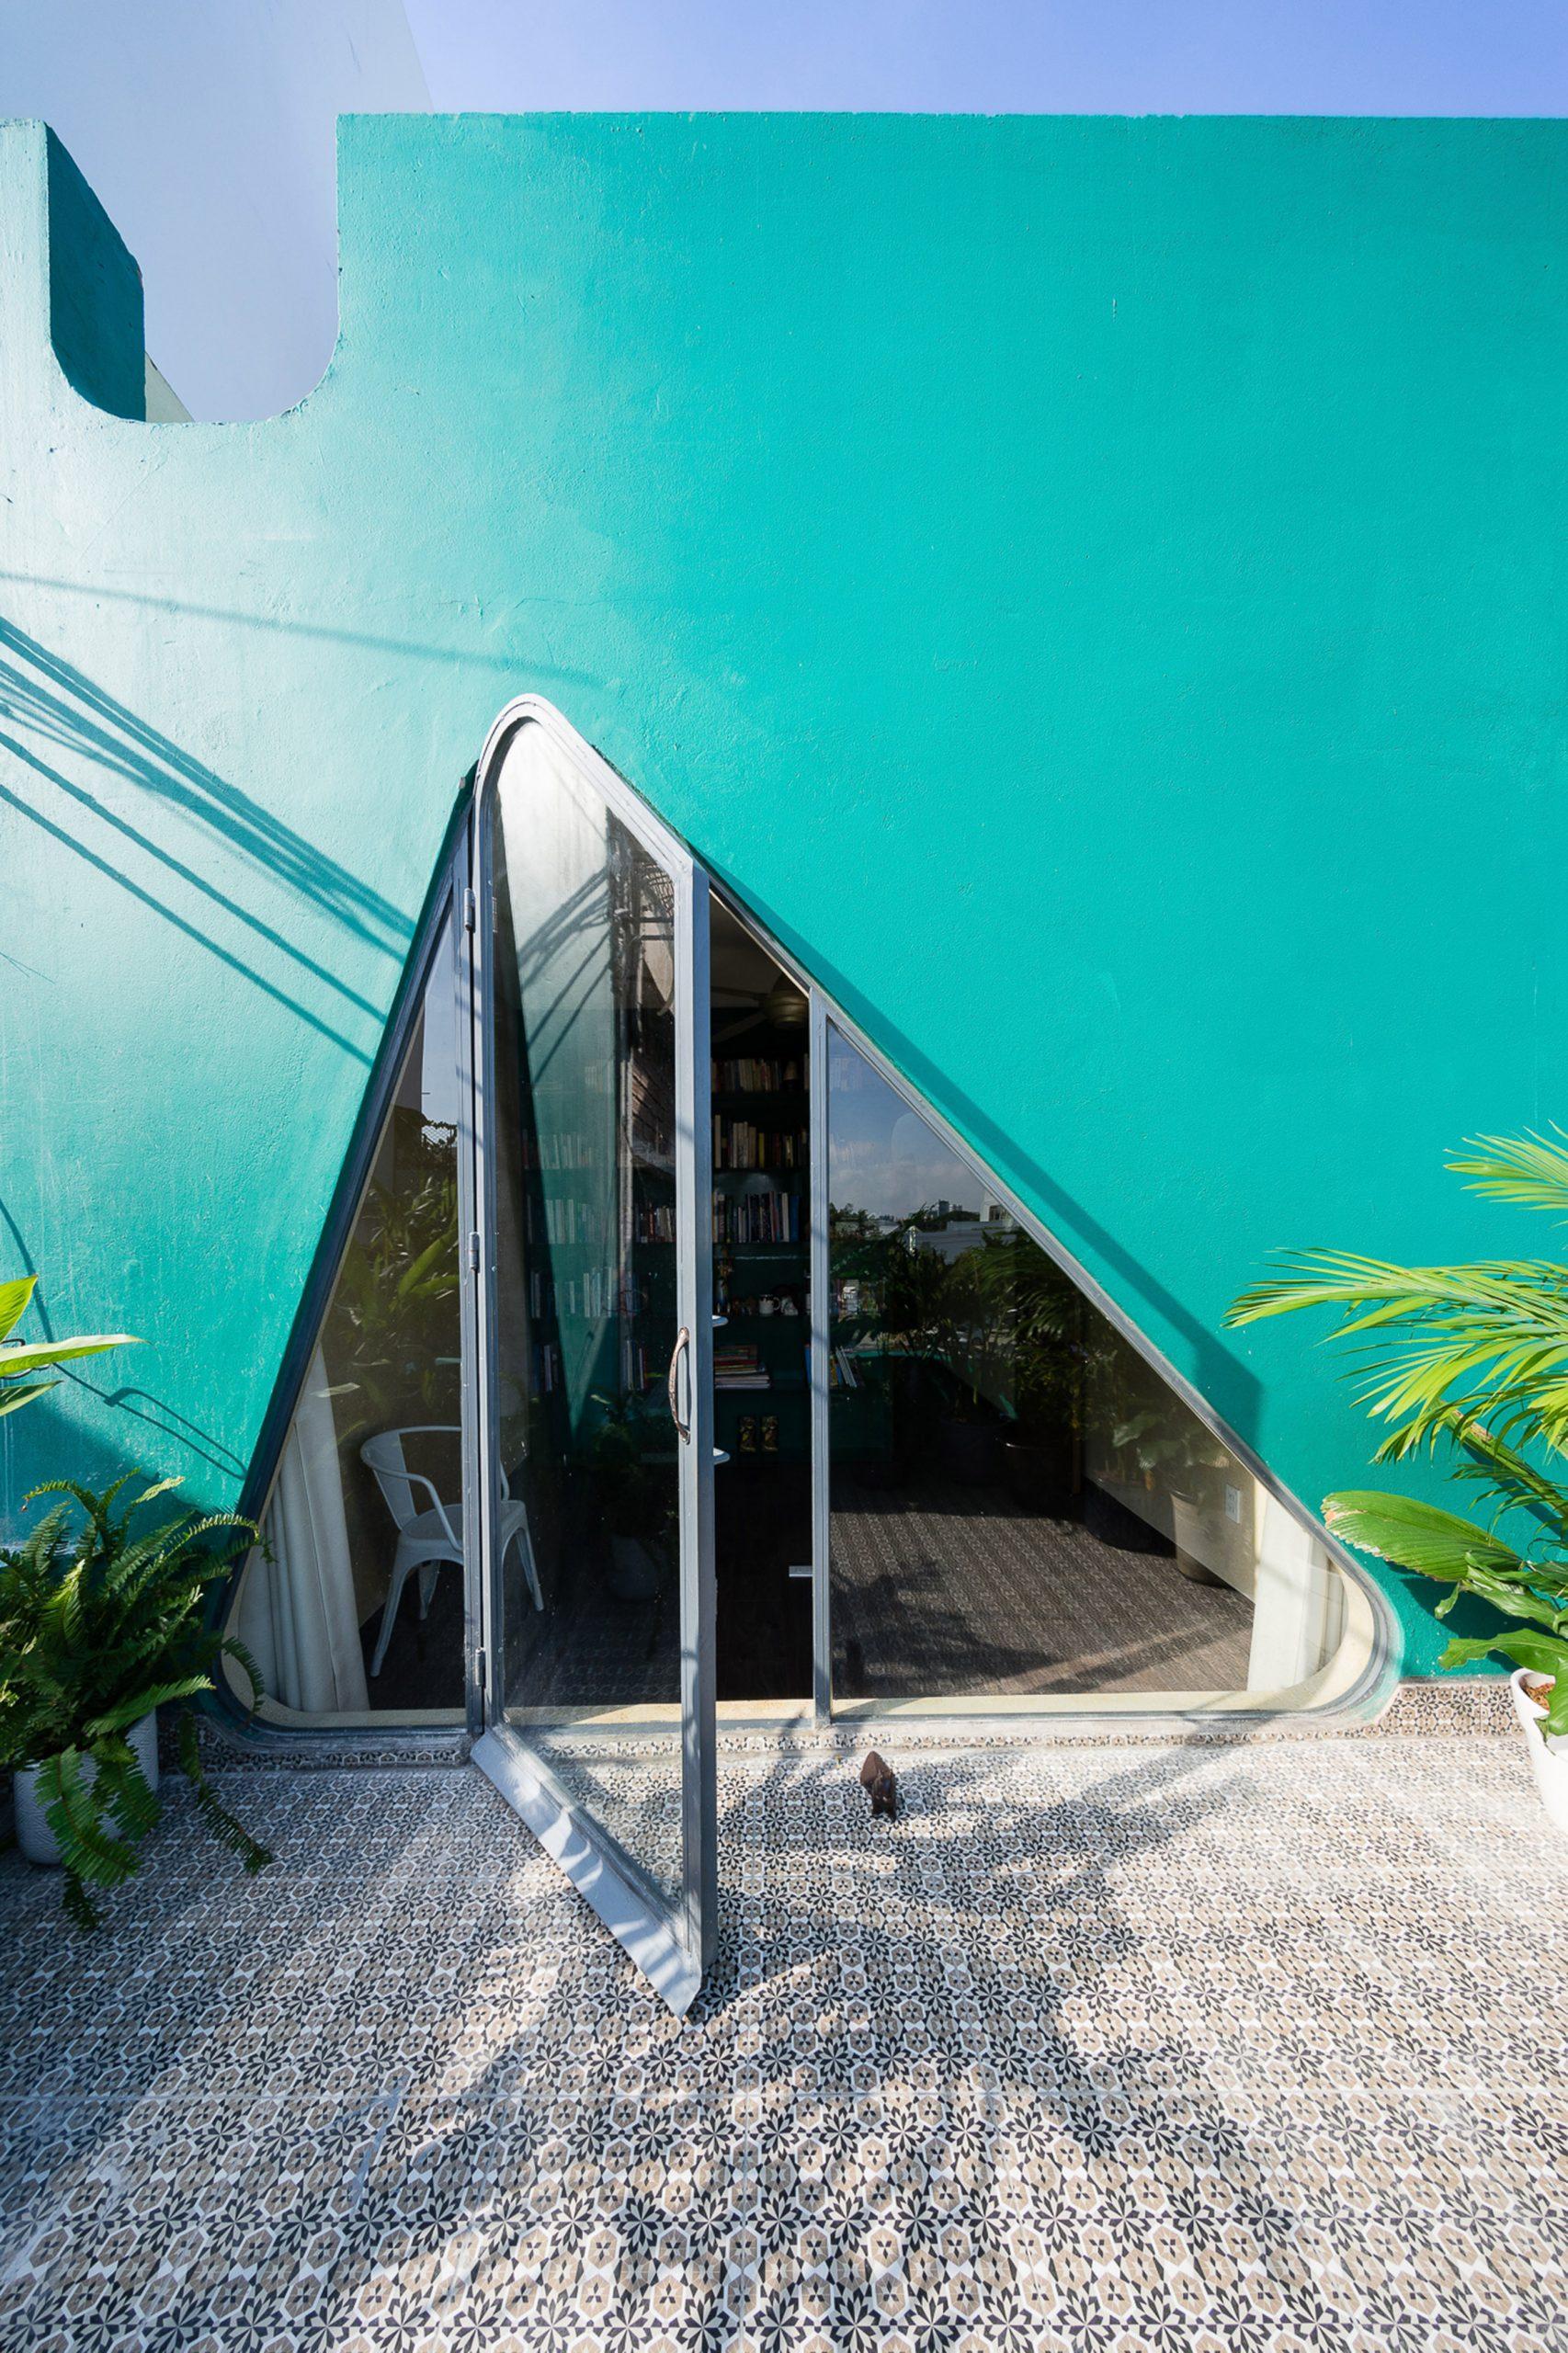 Gò Vấp House | H.a workshop